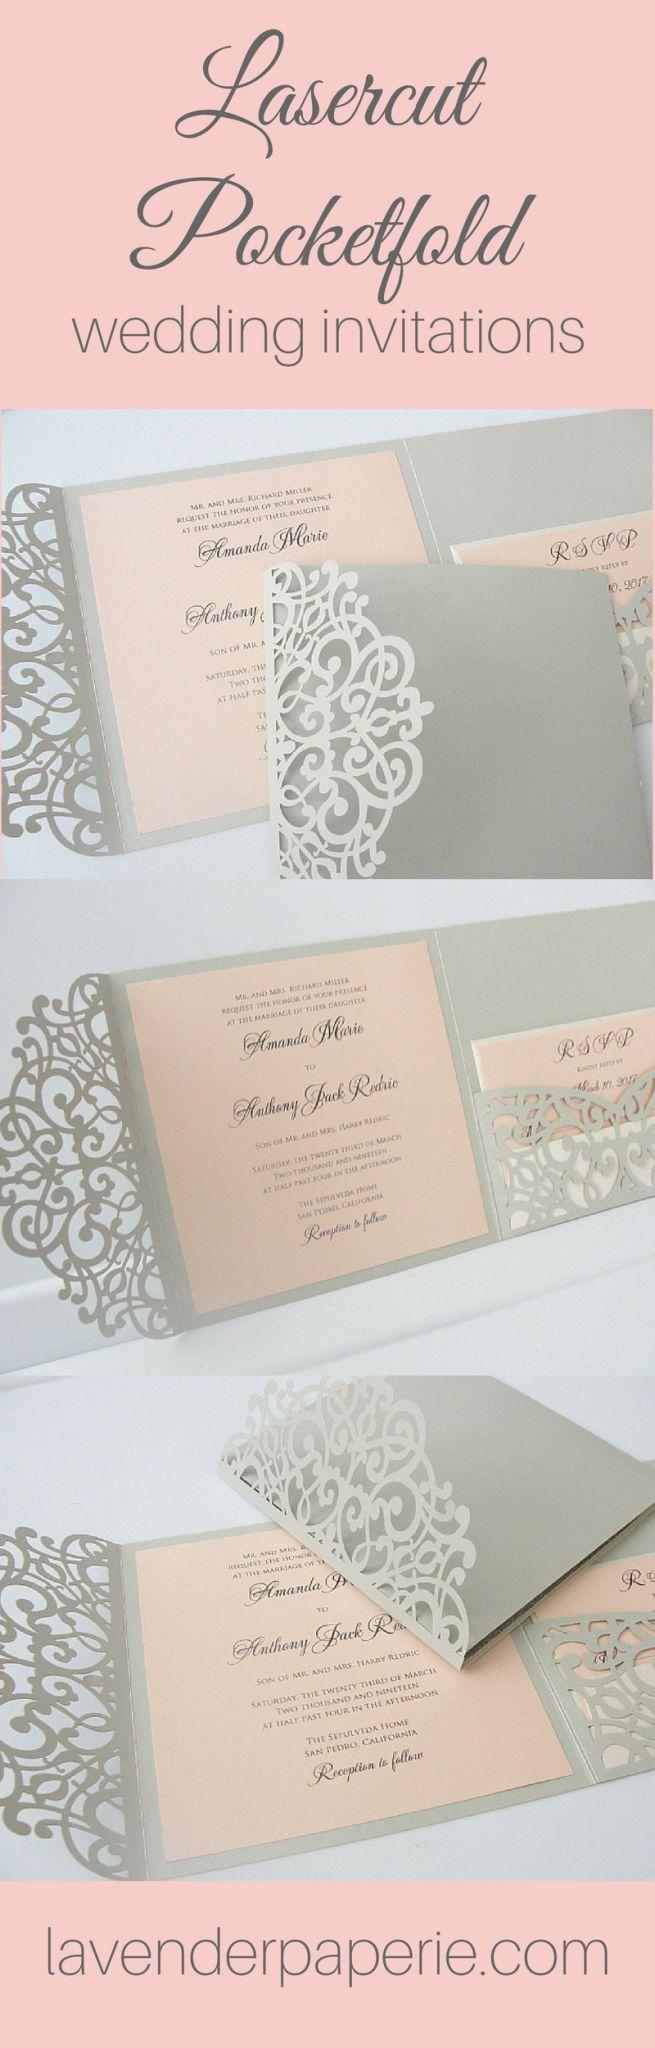 Laser Cut Pocketfold Wedding Invitations 239 best